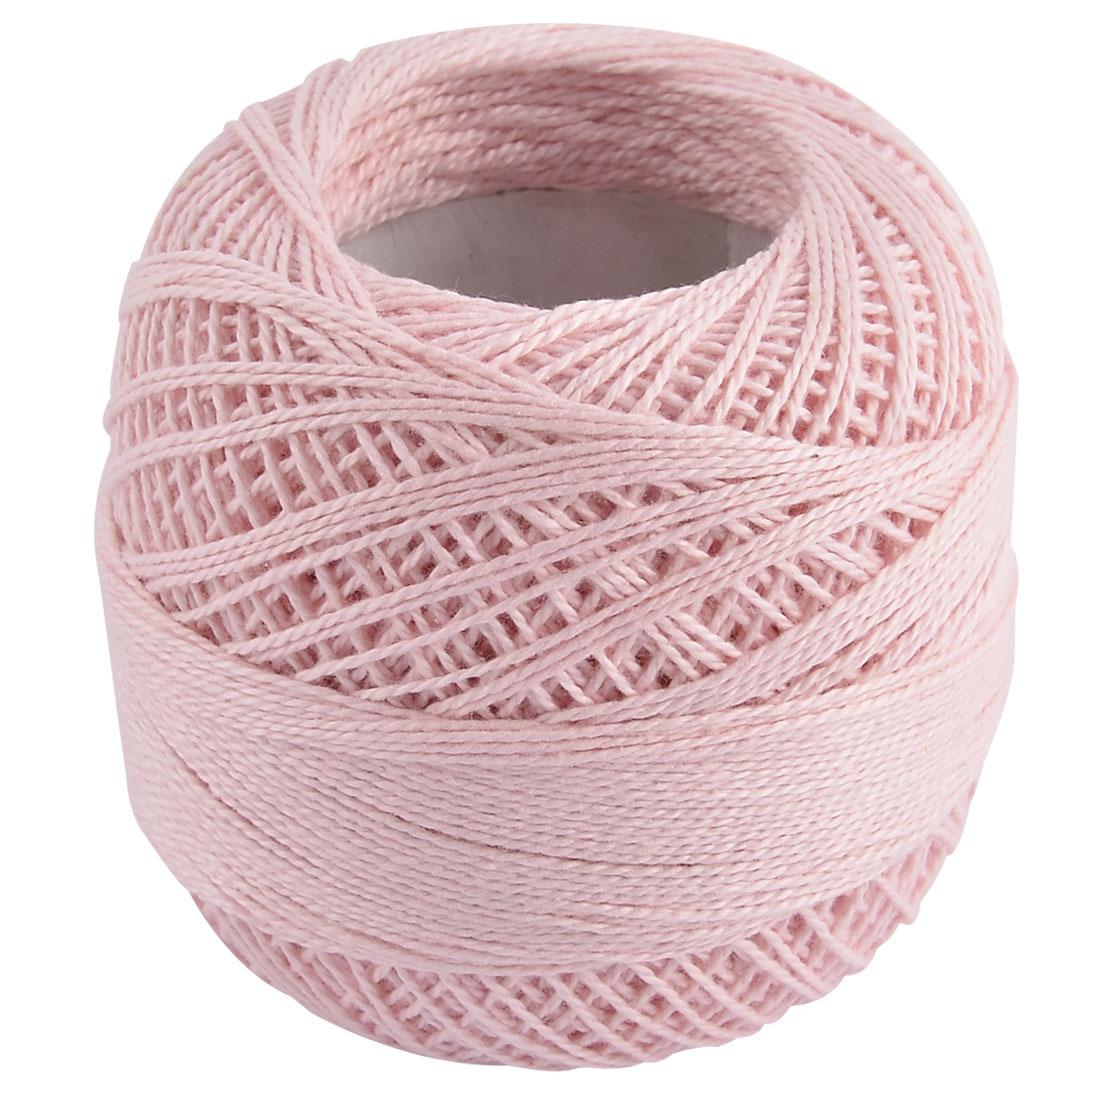 Cotton DIY Scarf Sweater Sock Crochet Handmade Hand Knitting Yarn Light Pink